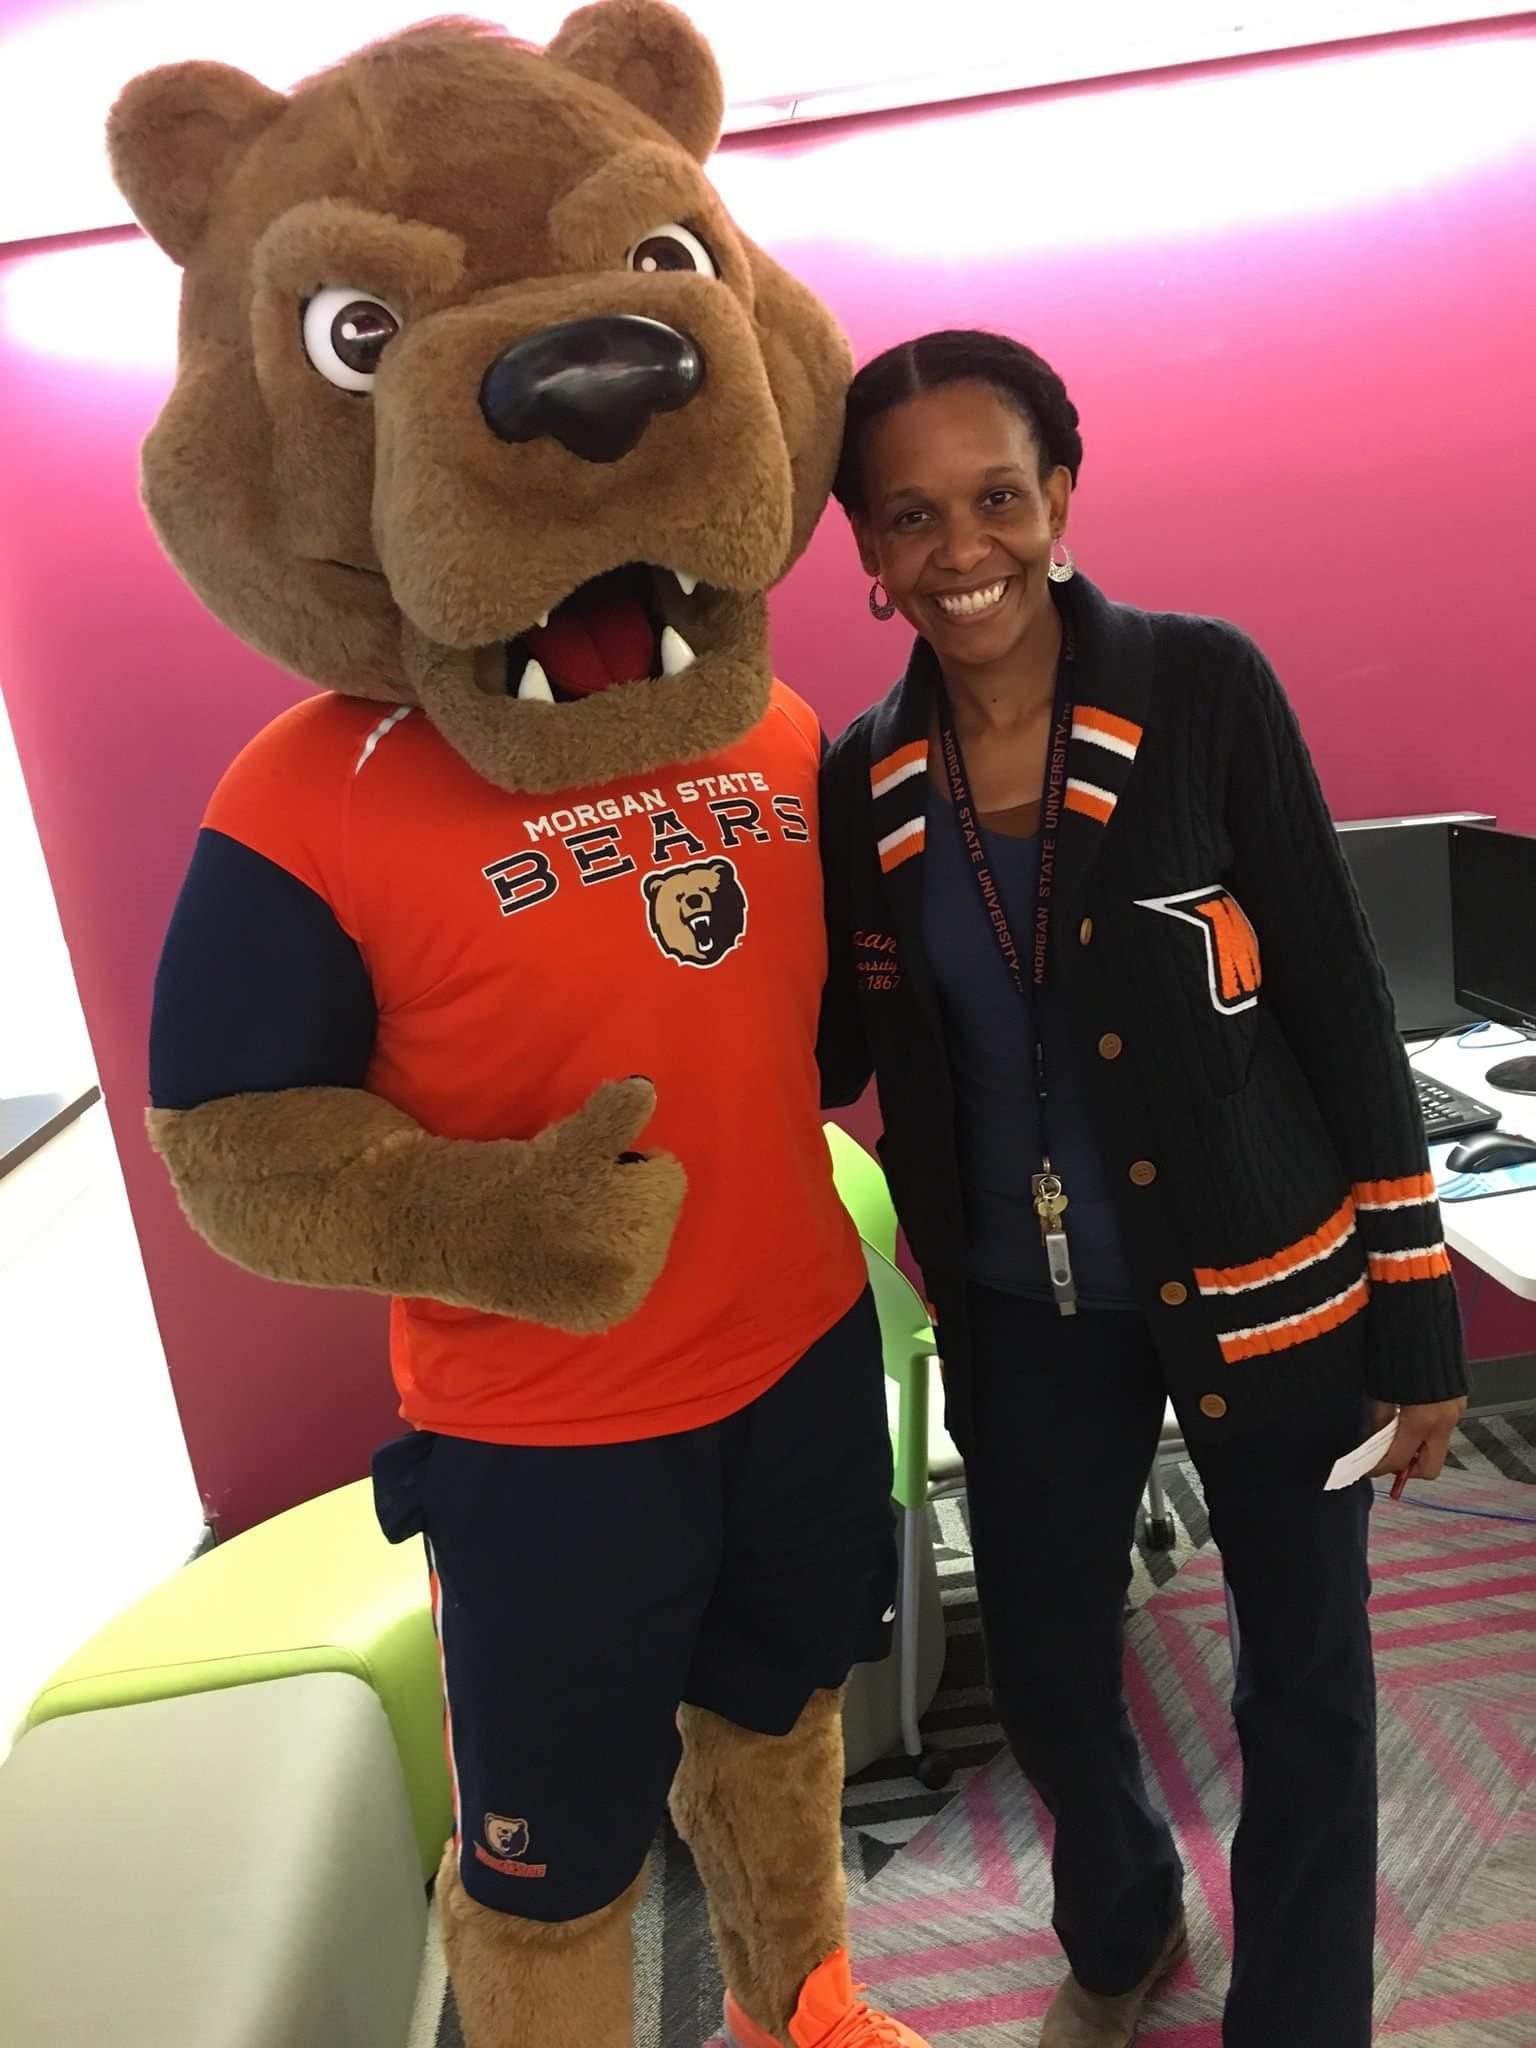 me and bear.jpg